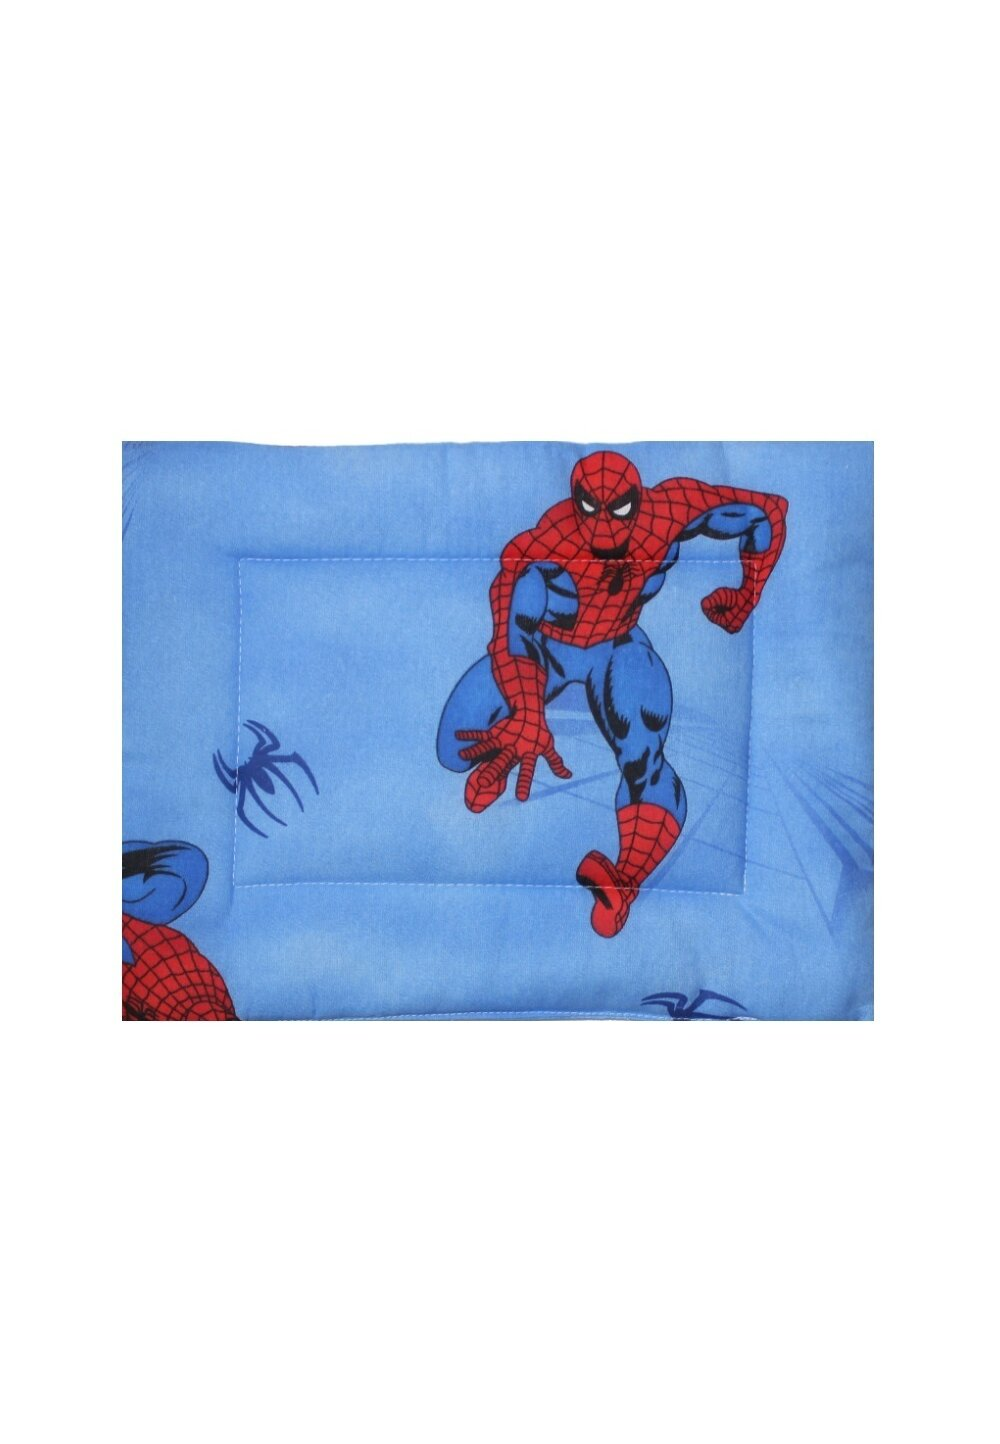 Perna slim, Spider-man, albastru, 37x28cm imagine